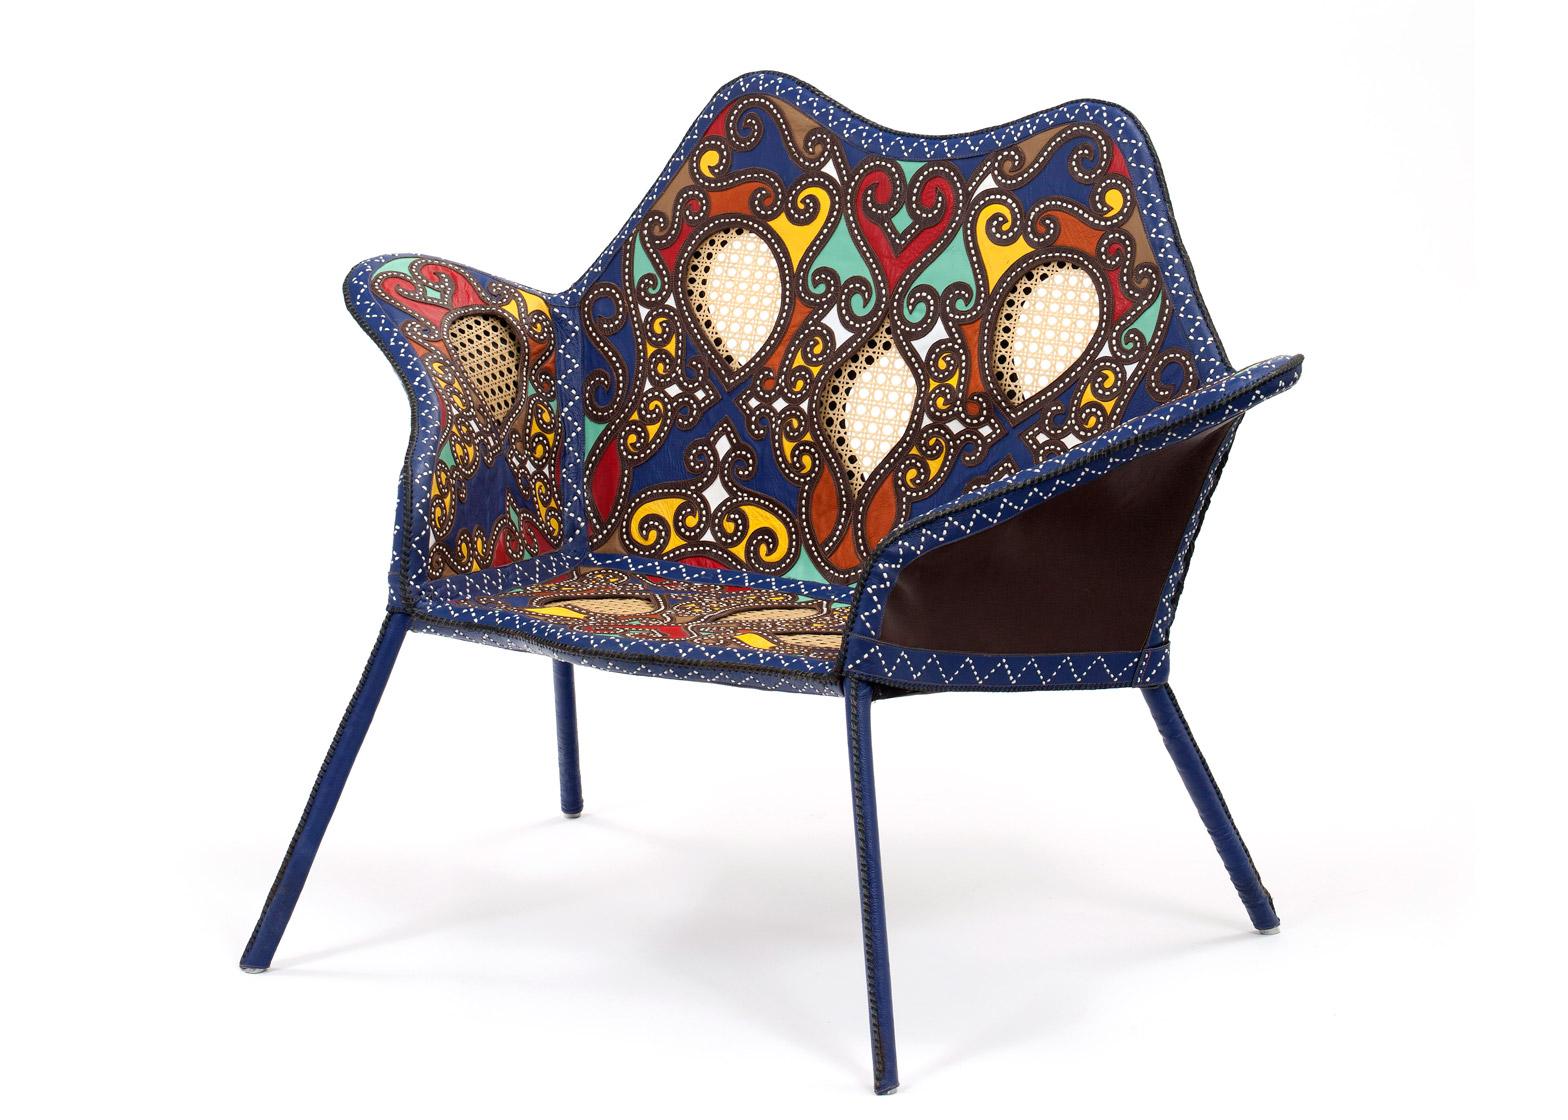 The-Cangaco-collection_Fernando-Humberto_Campana-Brothers_Firma-Casa_furniture-design_Design-Miami-2015_dezeen_1568_2.jpg